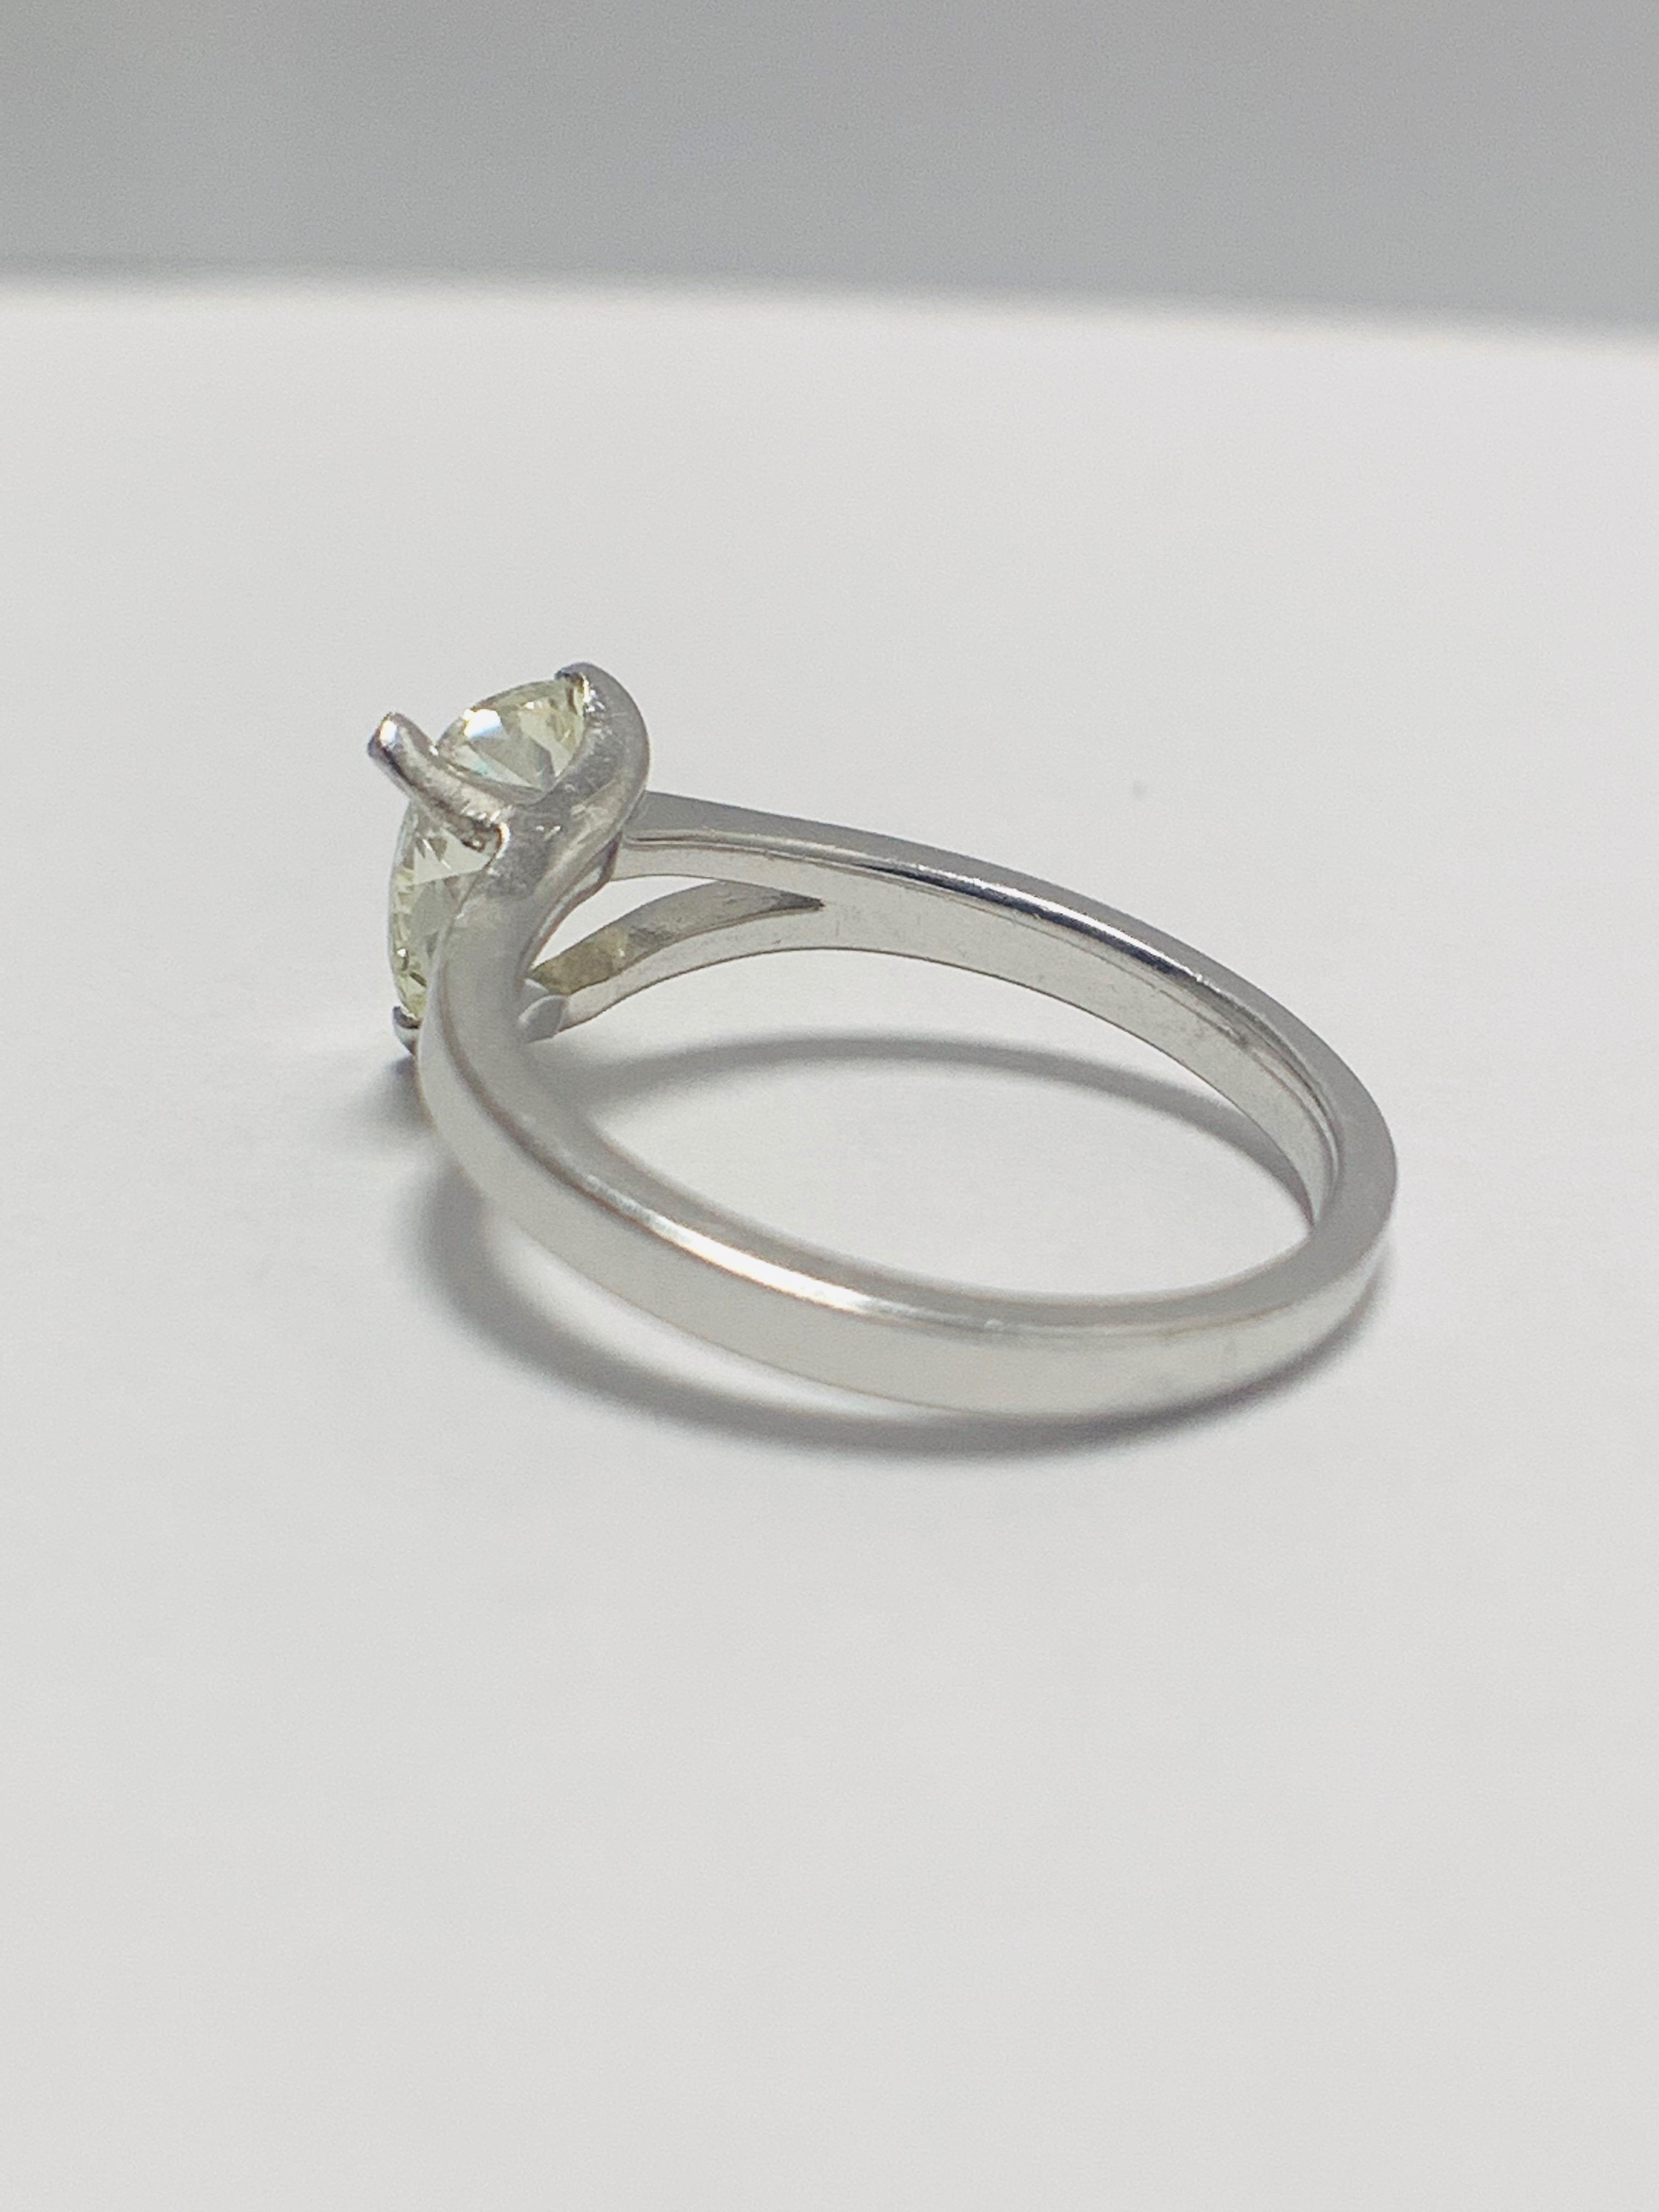 1ct Pearshape Diamond PLatinum Solitaire Ring. - Image 4 of 9